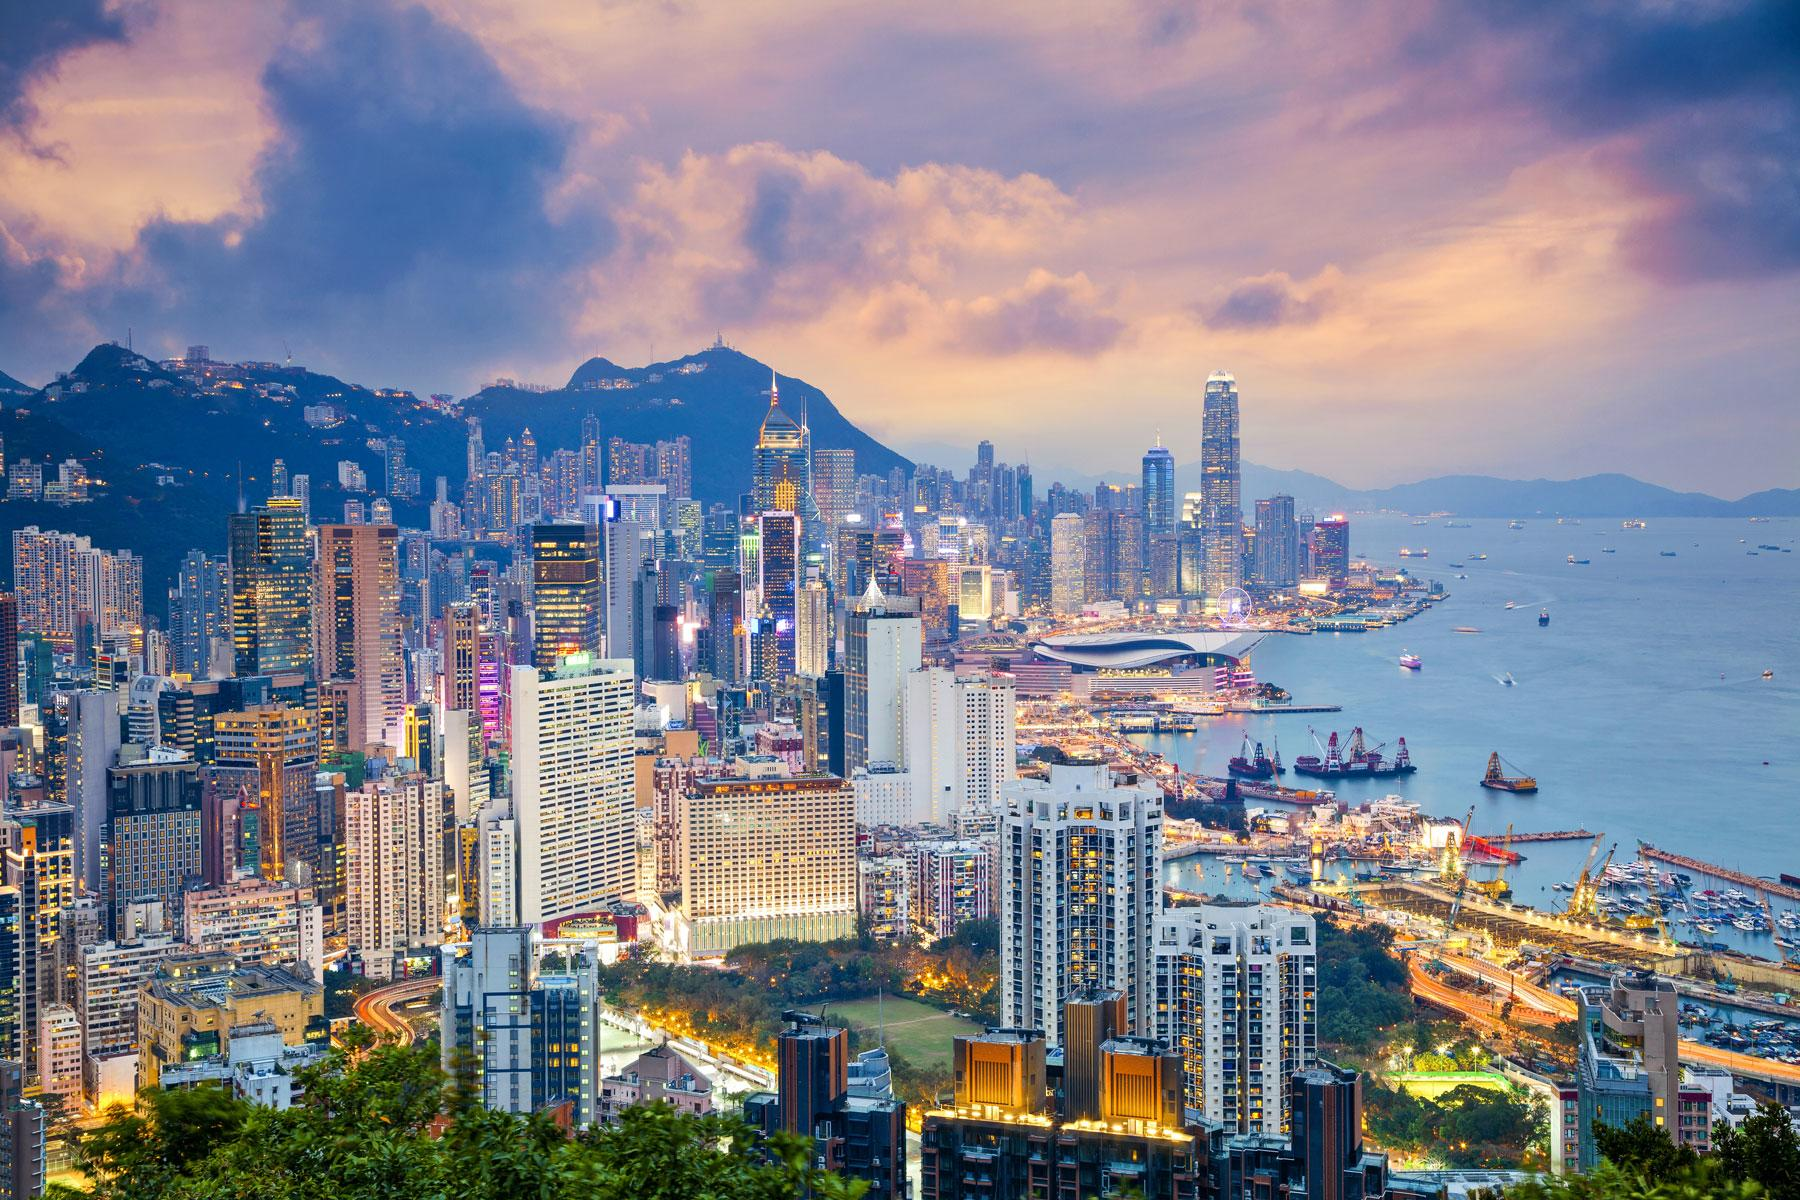 Hong Kong: Best Things To See And Do In Hong Kong